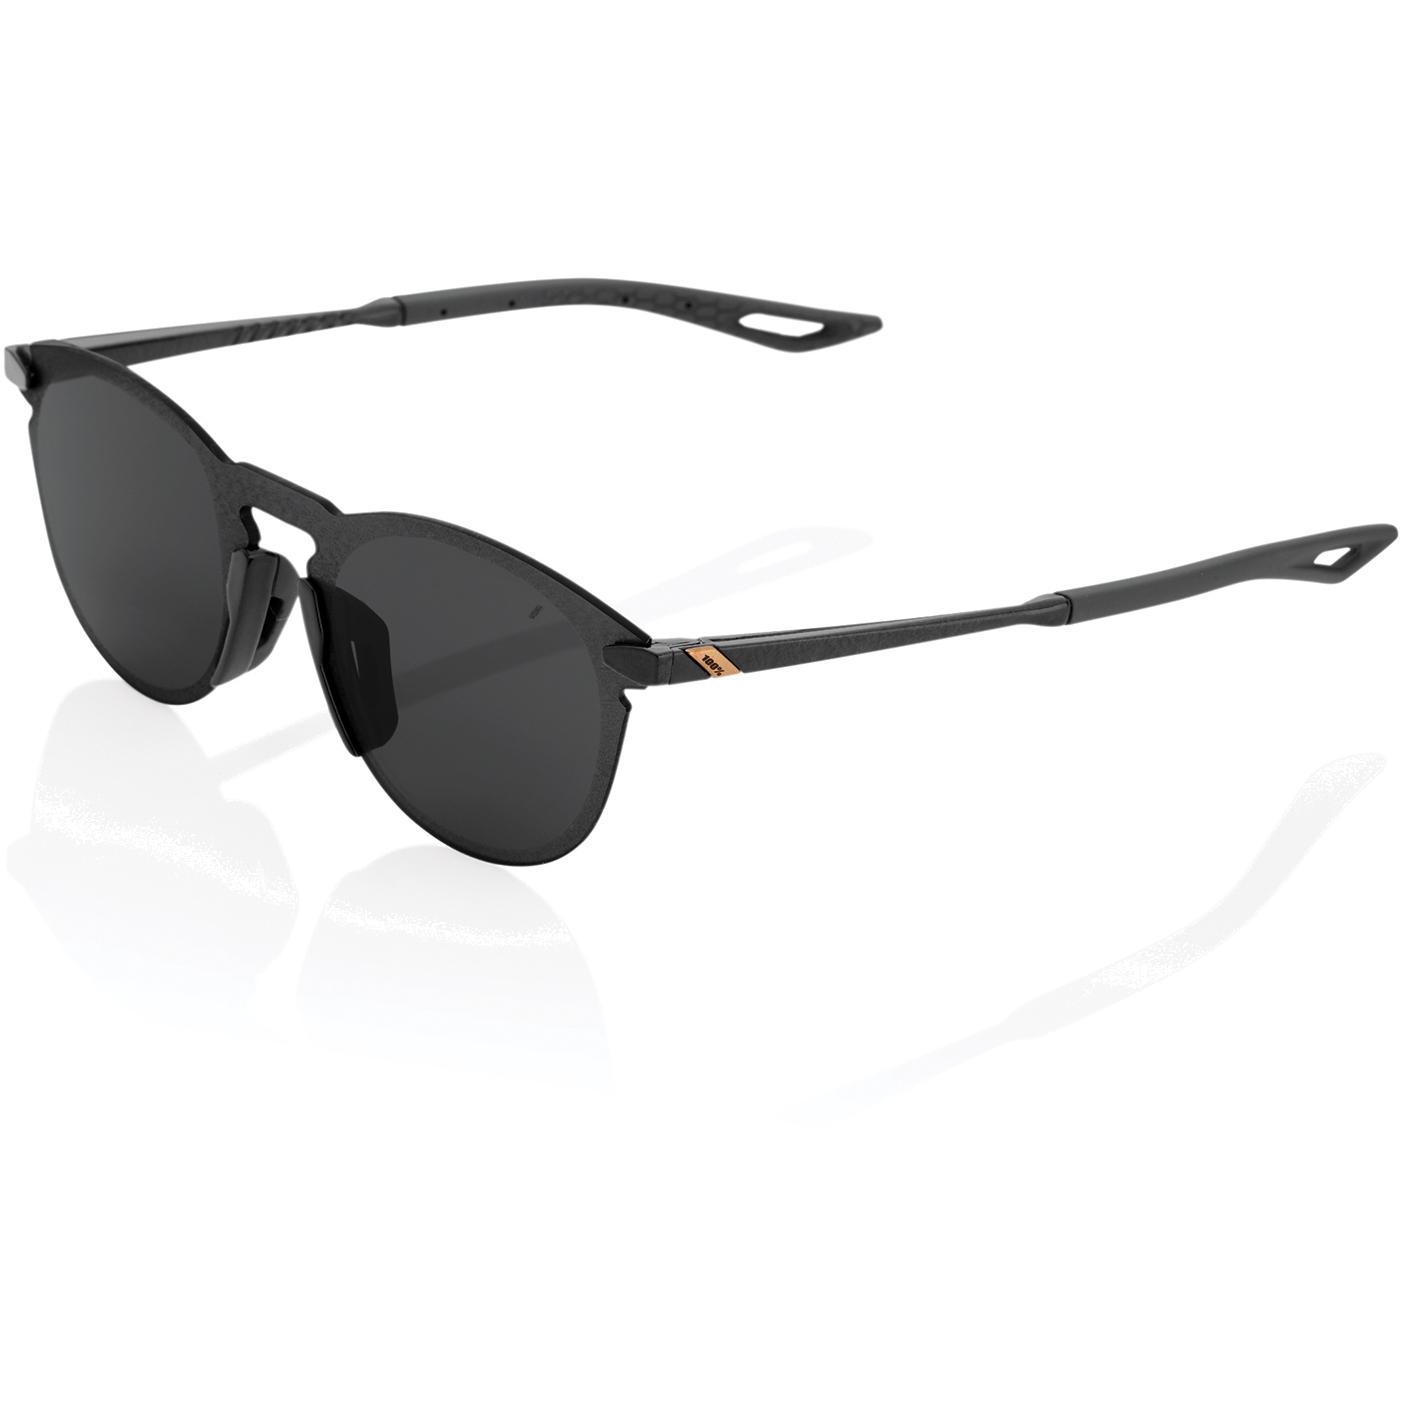 Imagen de 100% Legere UltraCarbon round Gafas - Smoke Lens - Polished Black